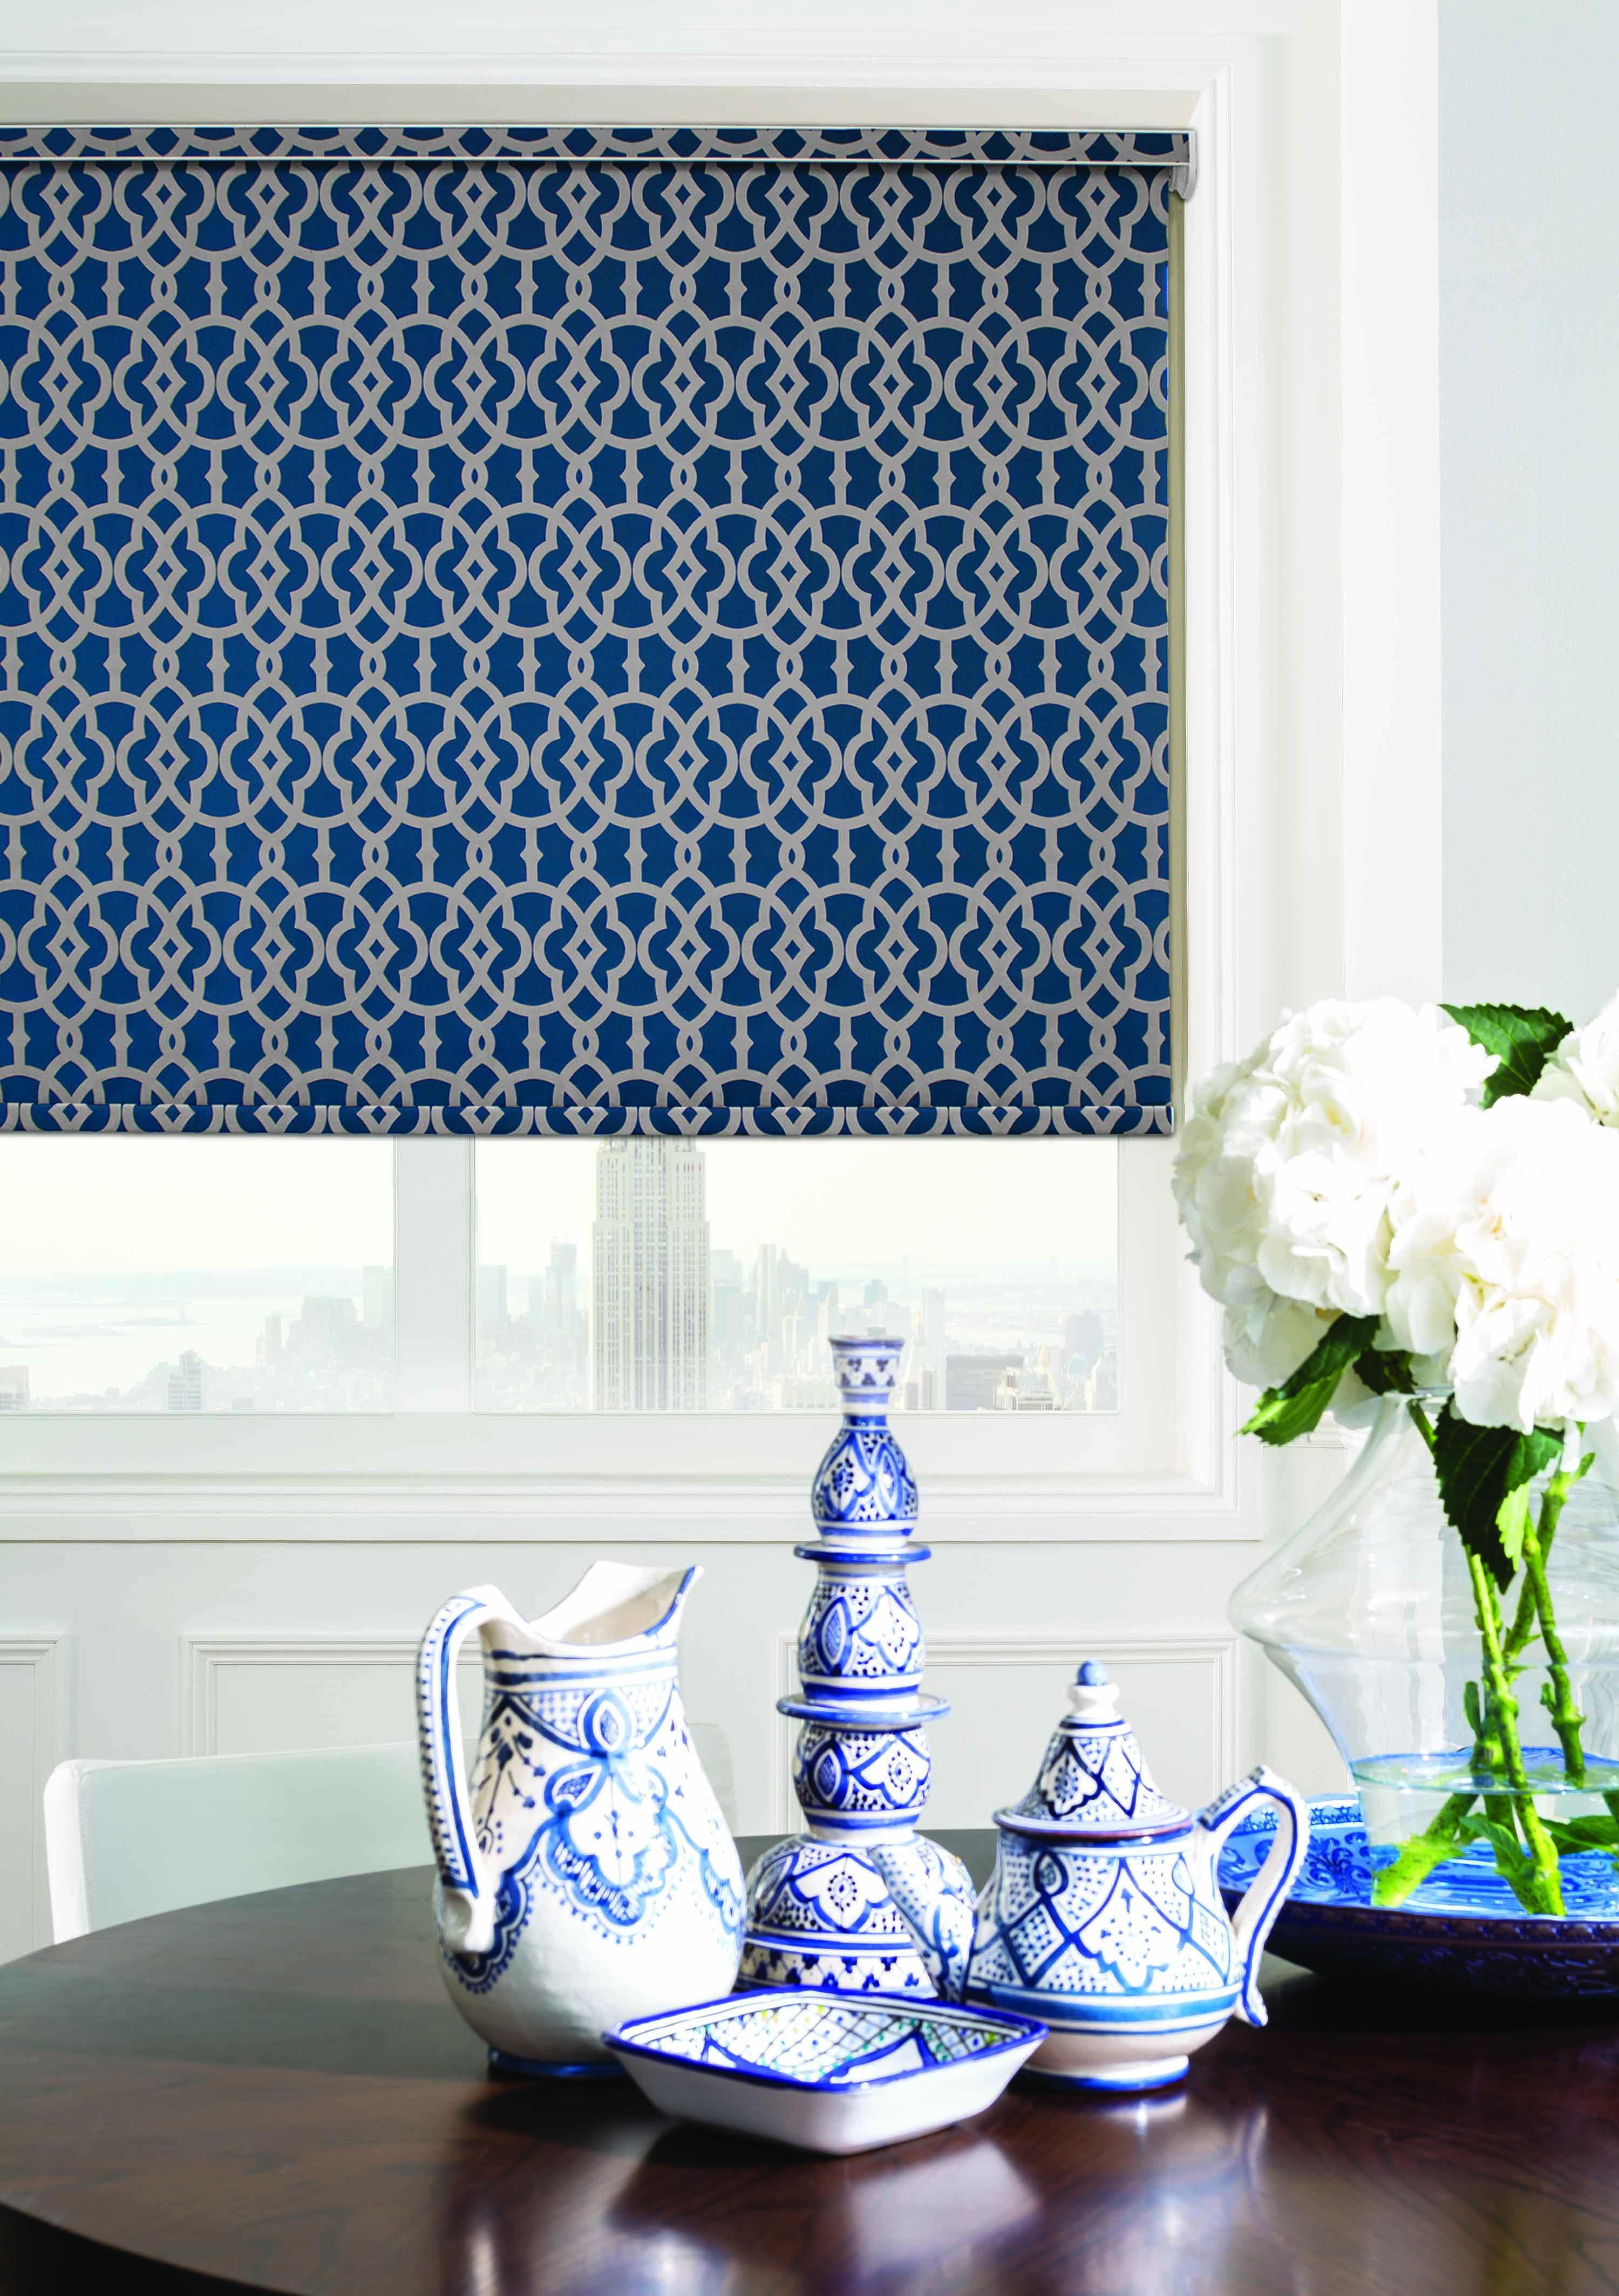 Choose at Home Blinds - Marrakesh Morrcan, Morrocan Theme, Marrakech ...